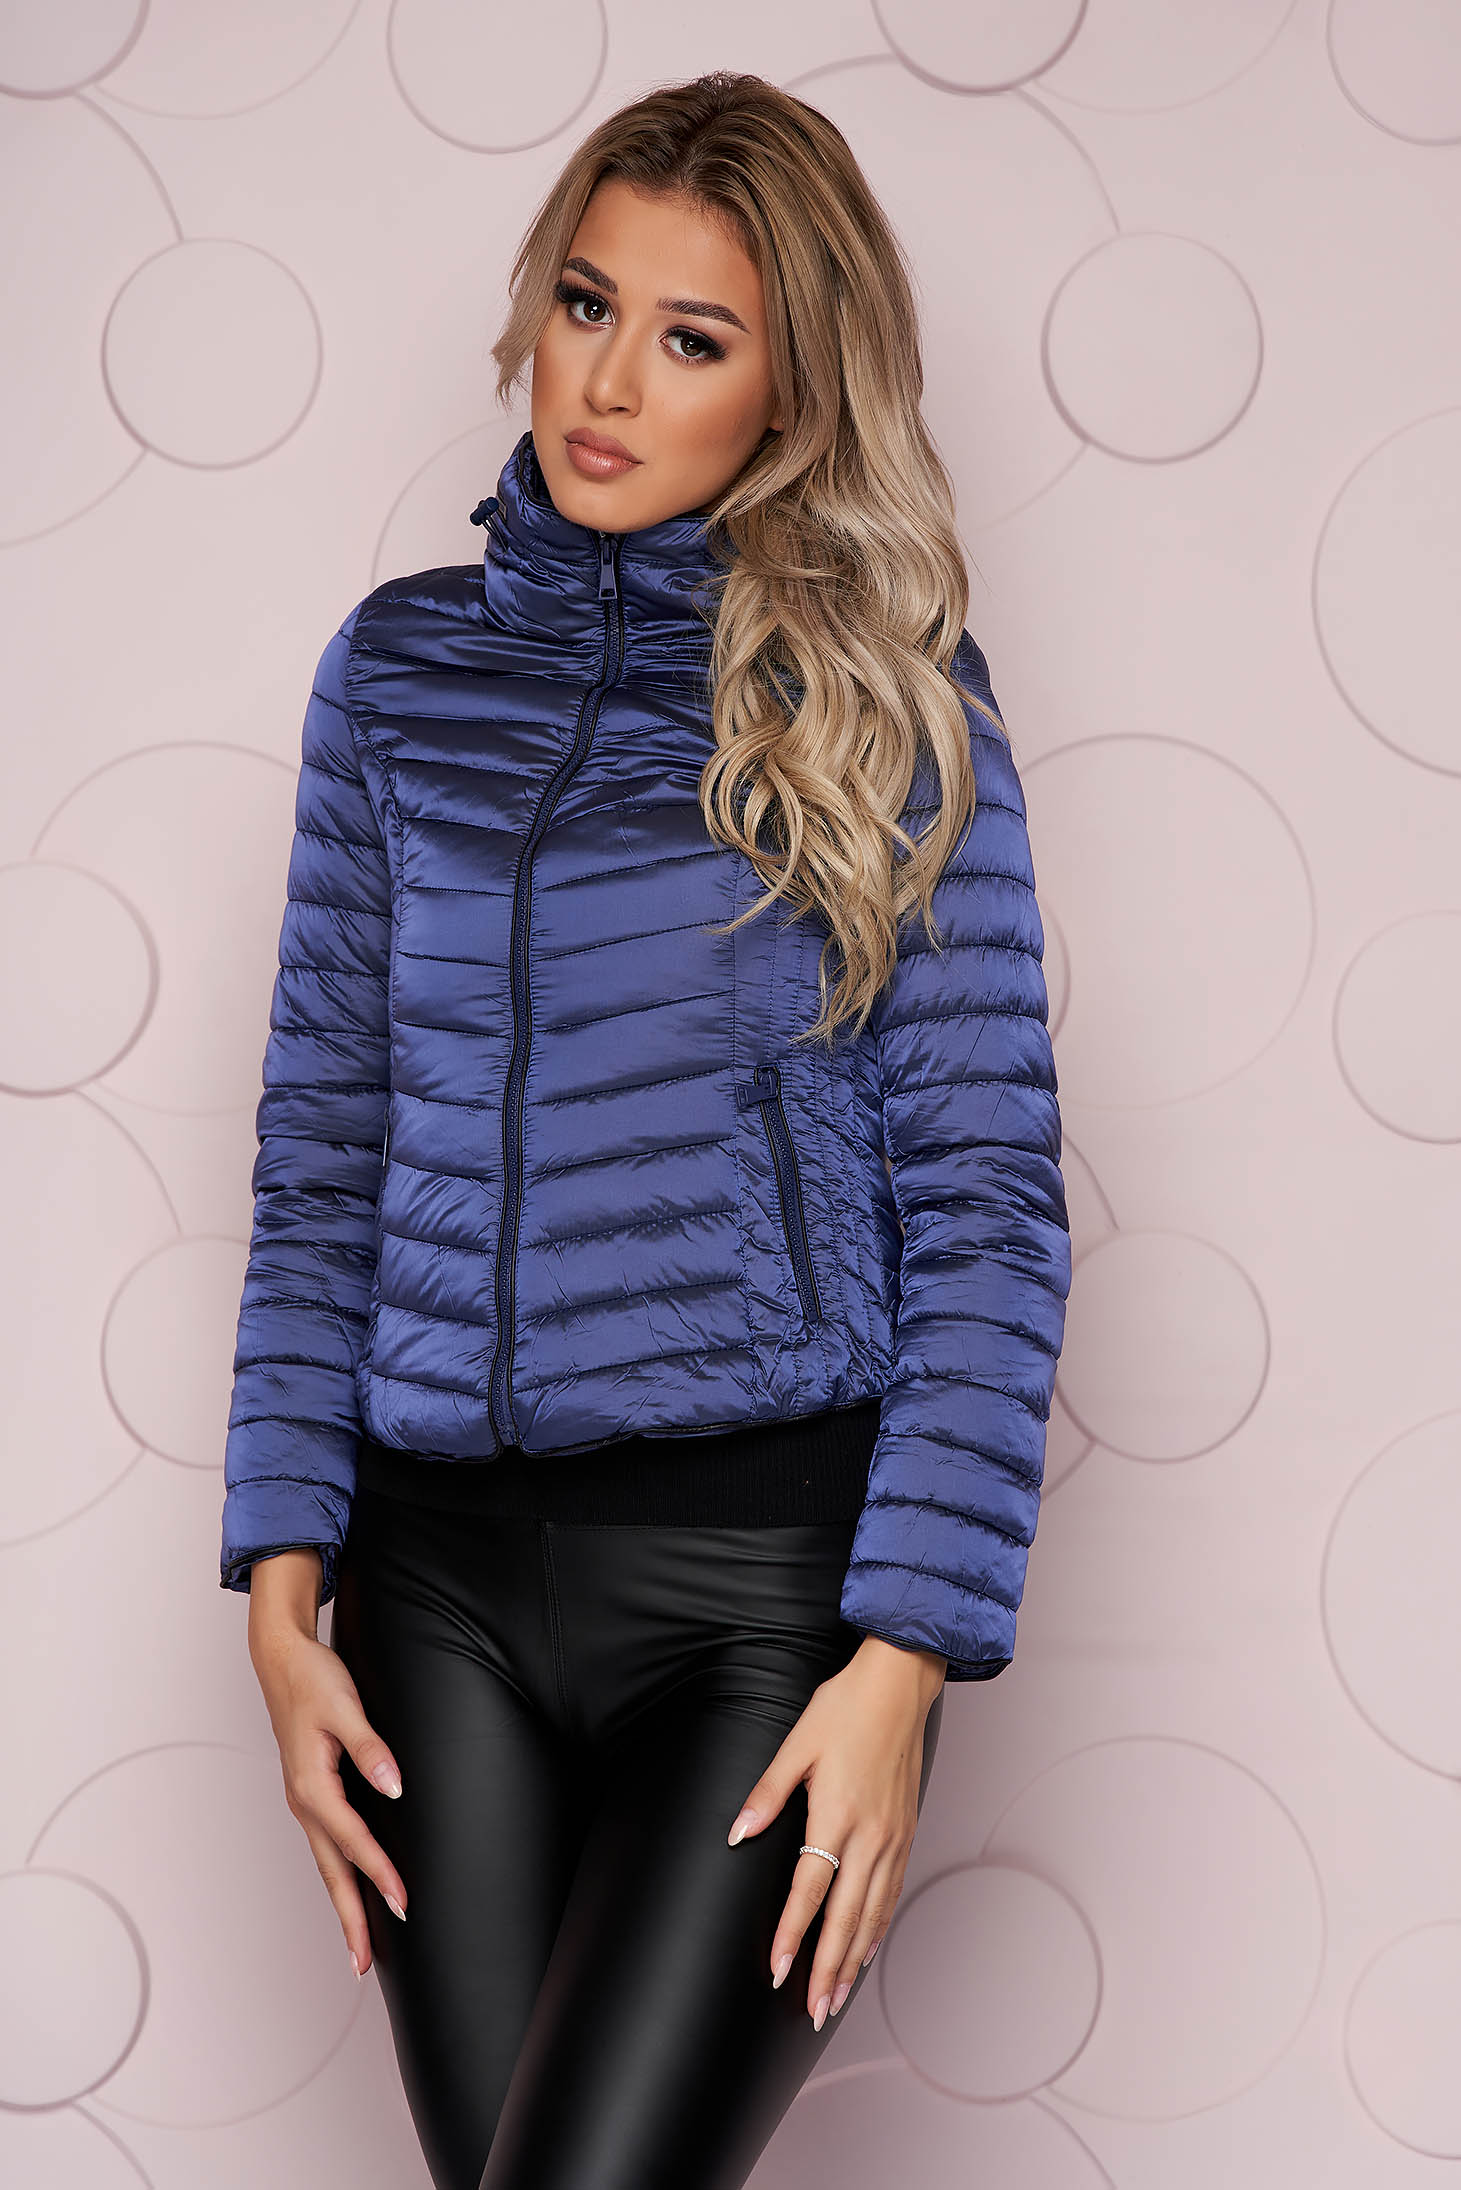 Darkblue jacket tented short cut from slicker with zipper details pockets